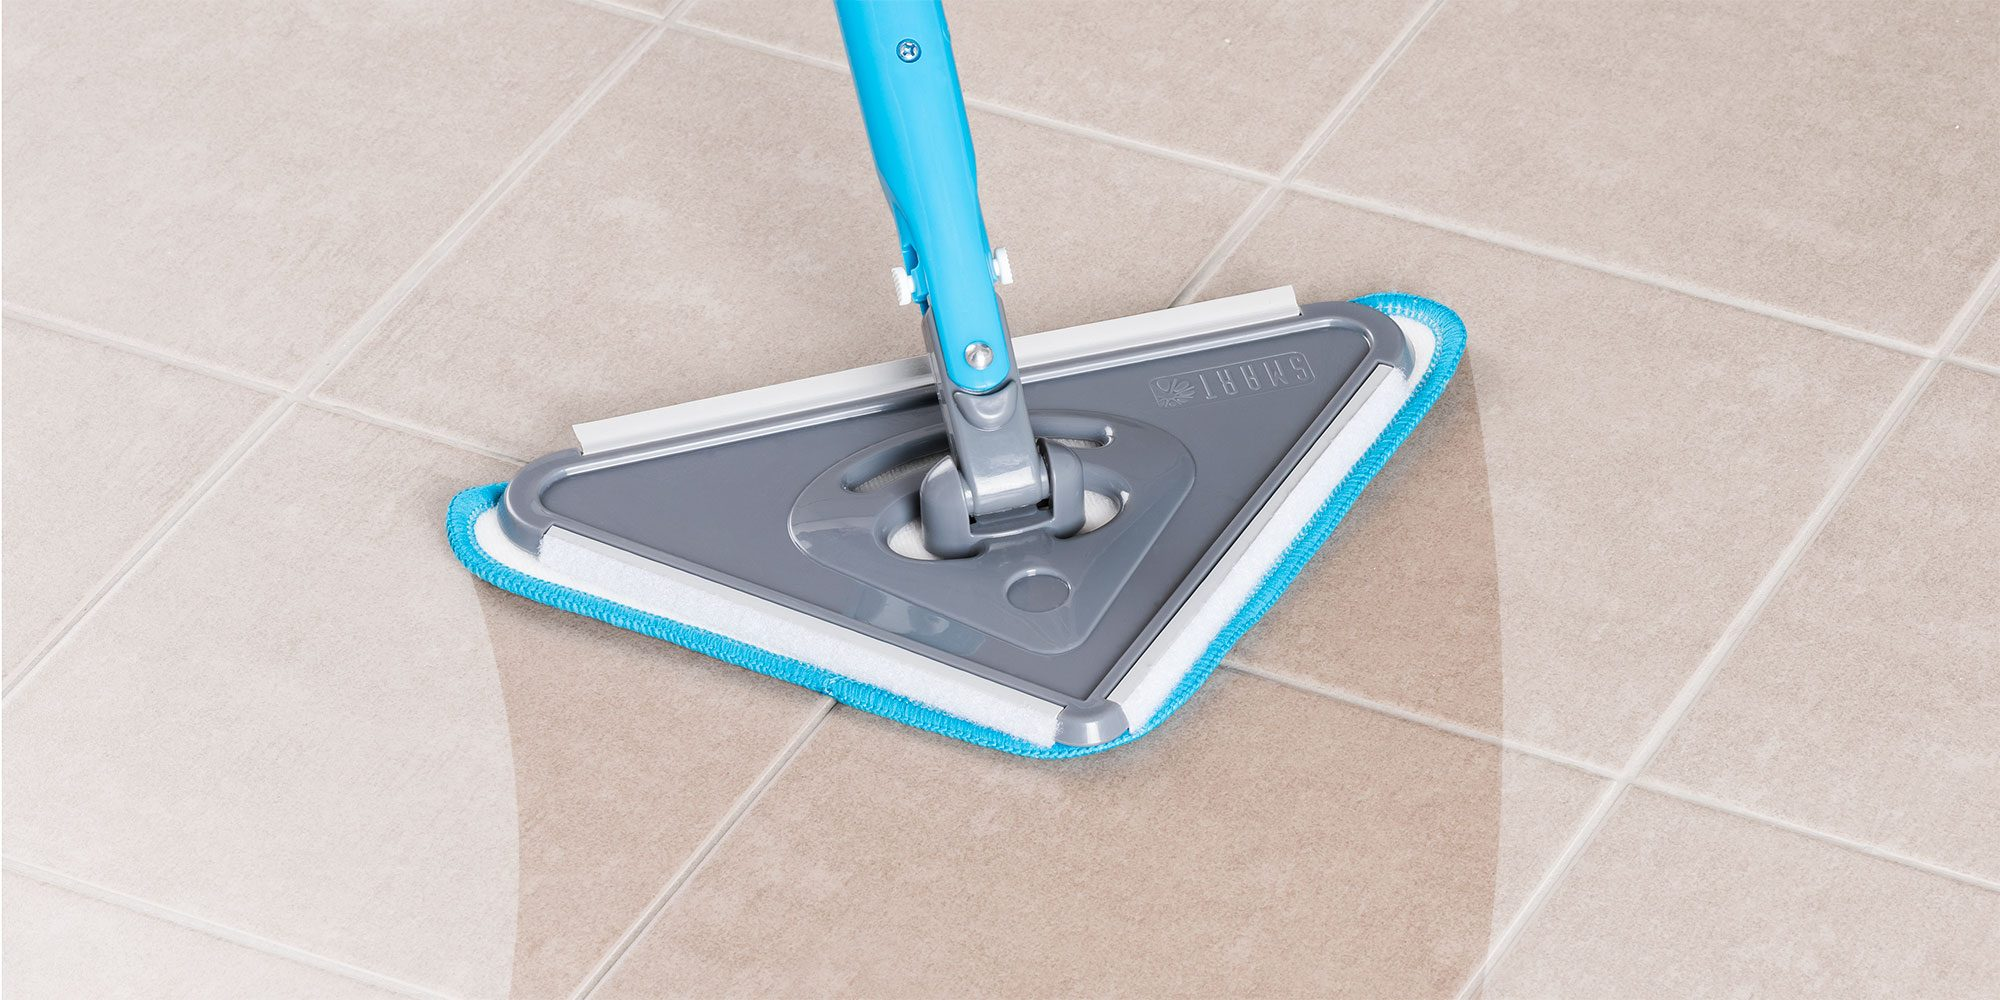 multitool mop system – Smart Microfiber